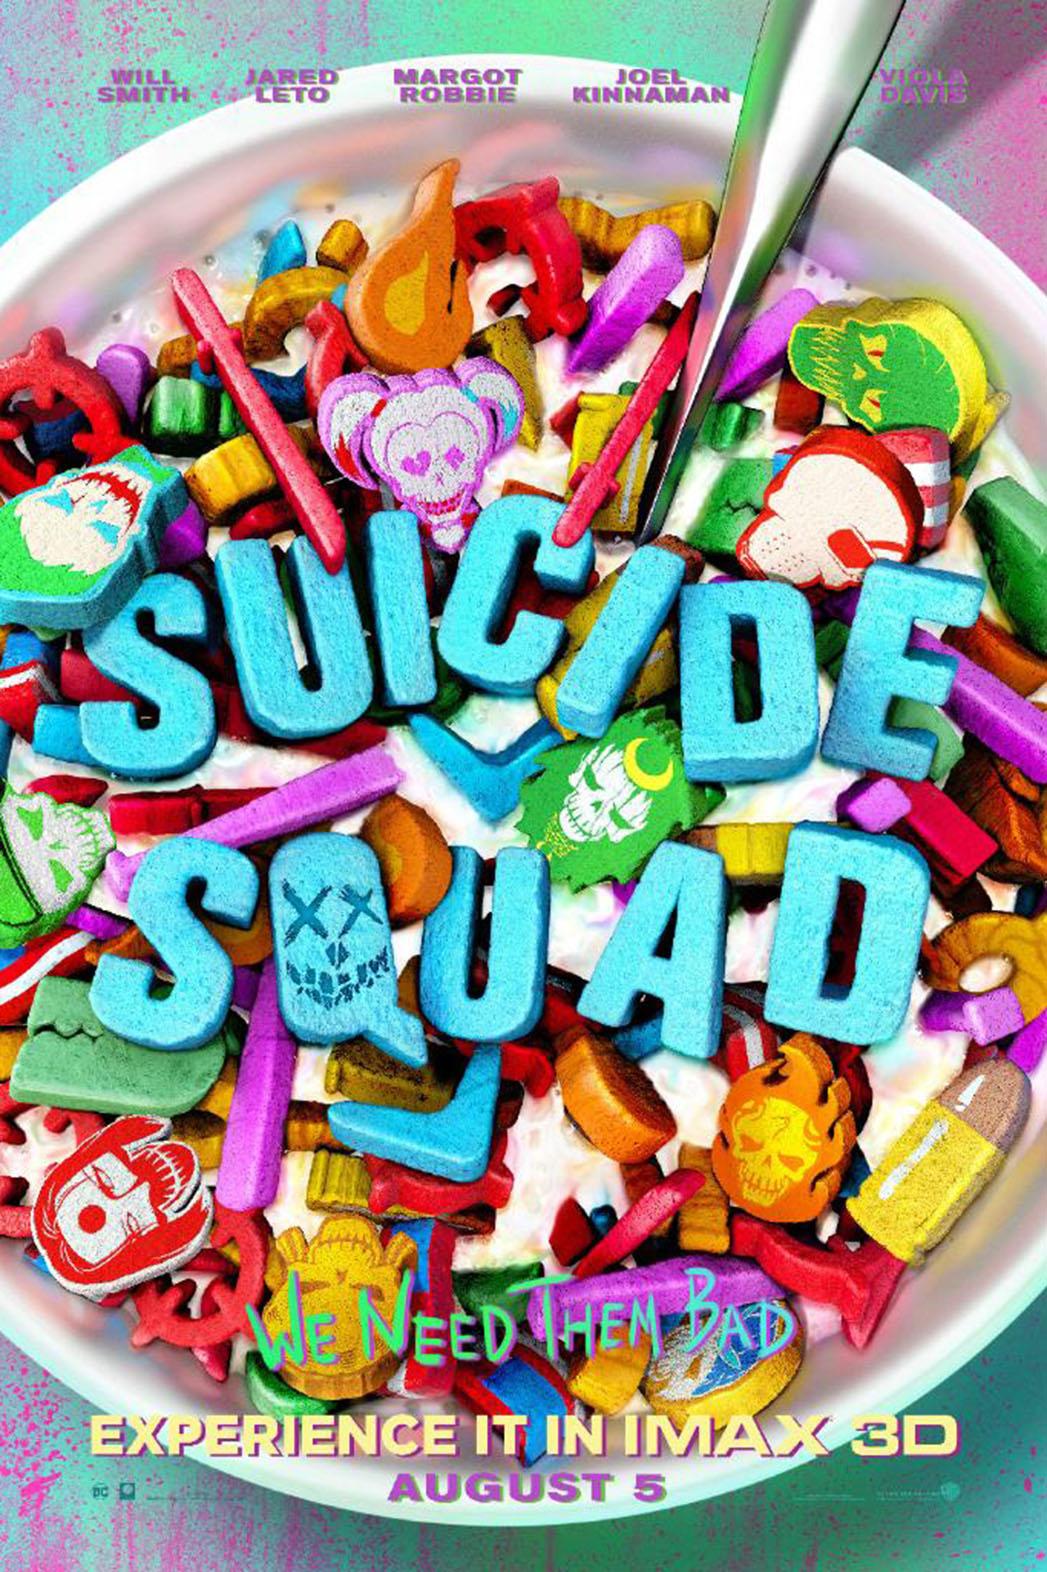 Suicide Squad Twitter P 2016